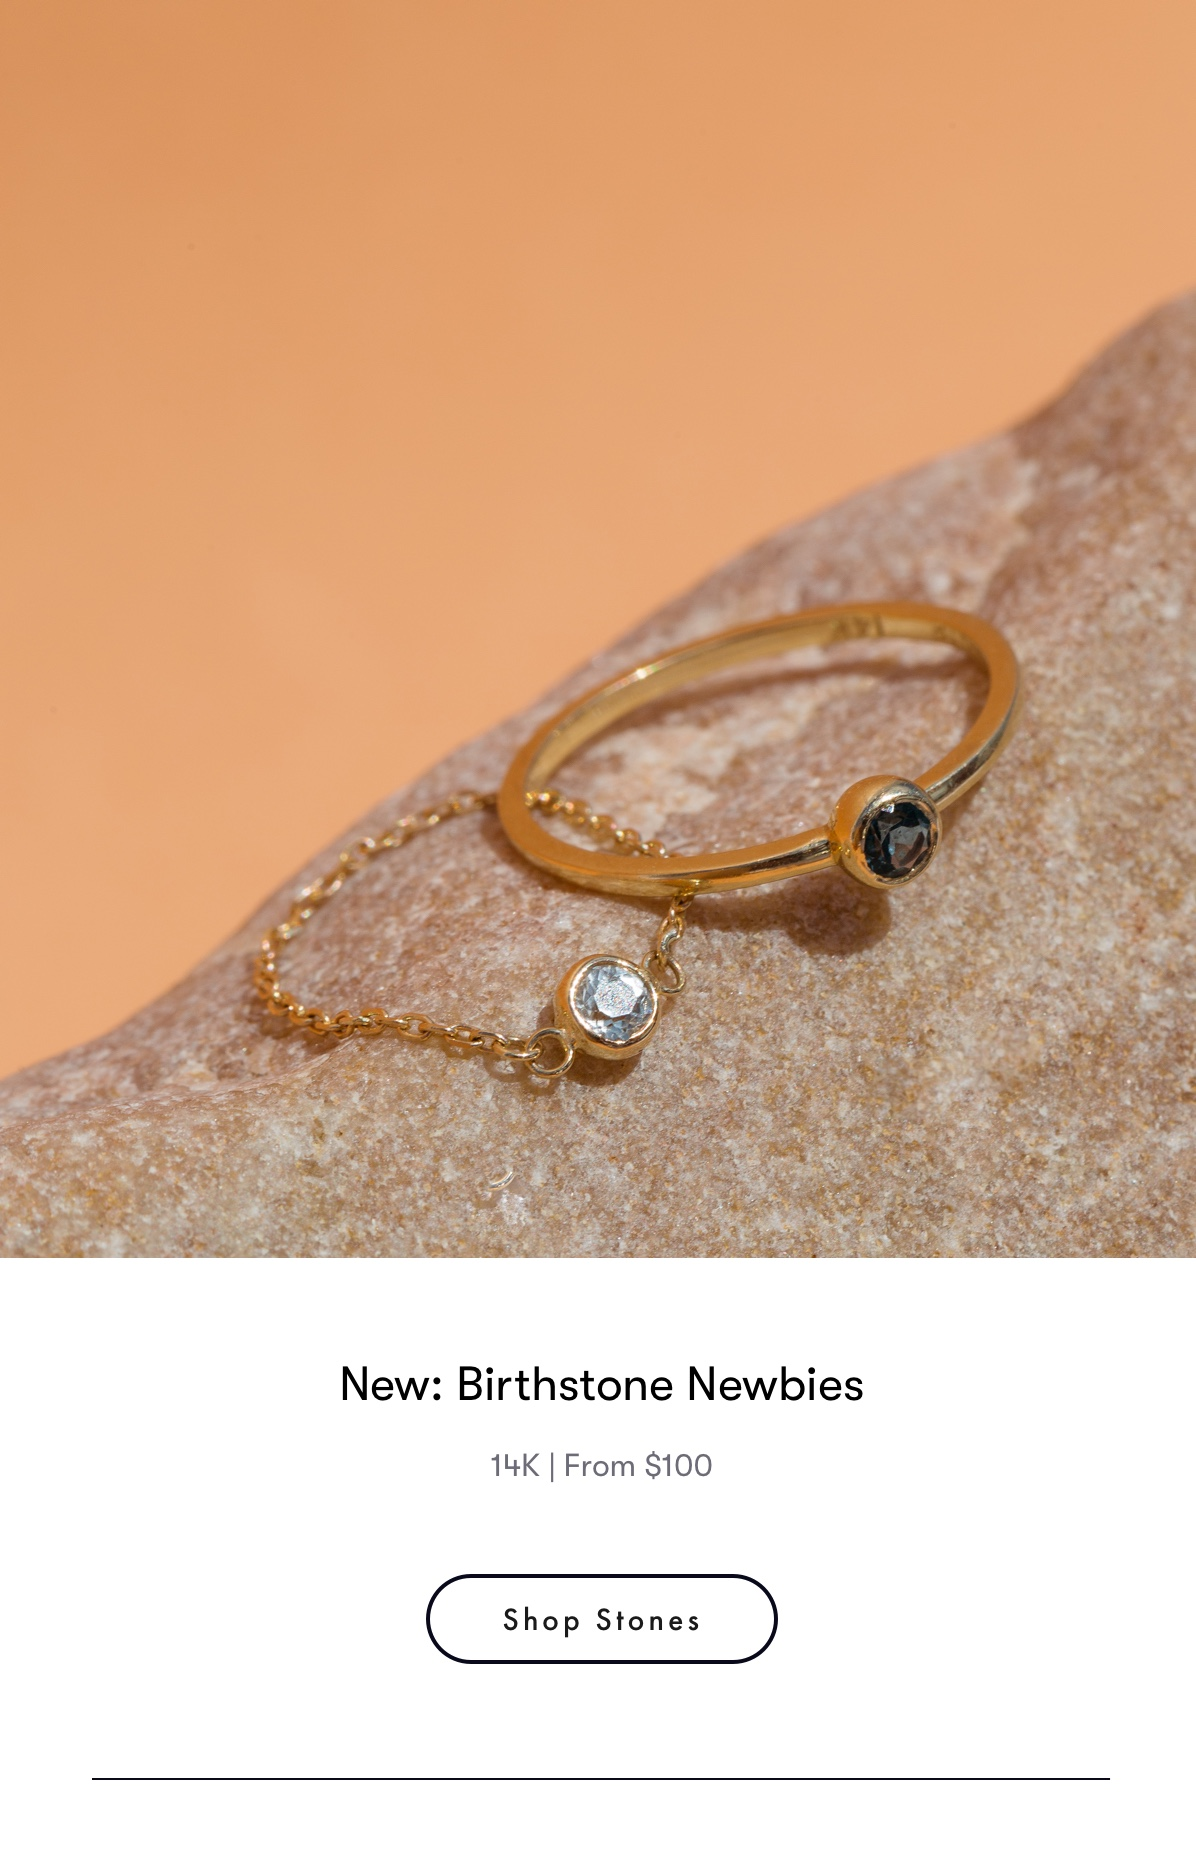 birthstone newbies